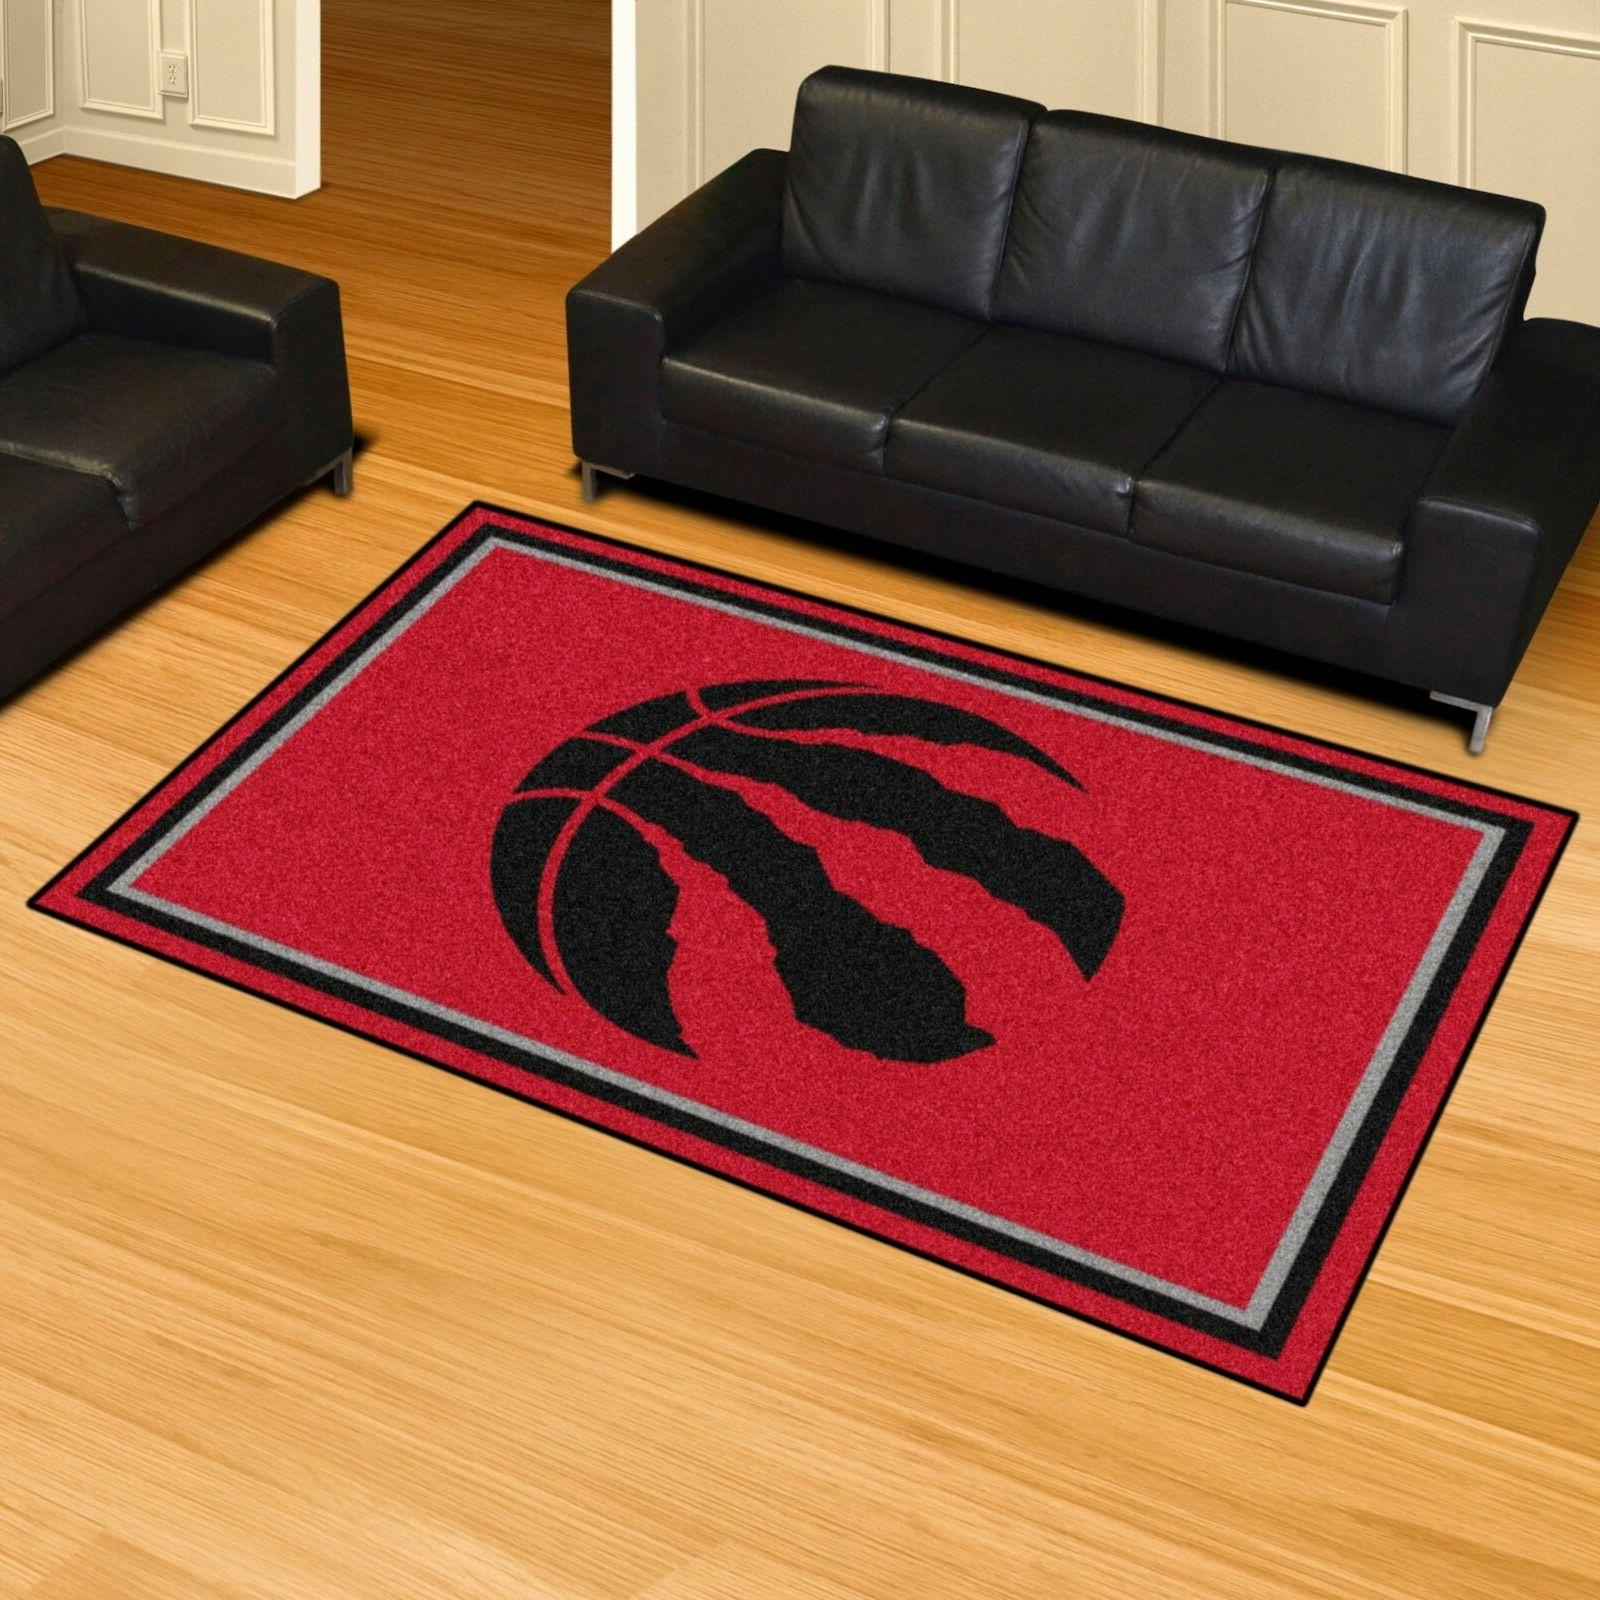 NBA Toronto Raptors 5' x 8' - Novelty Mat